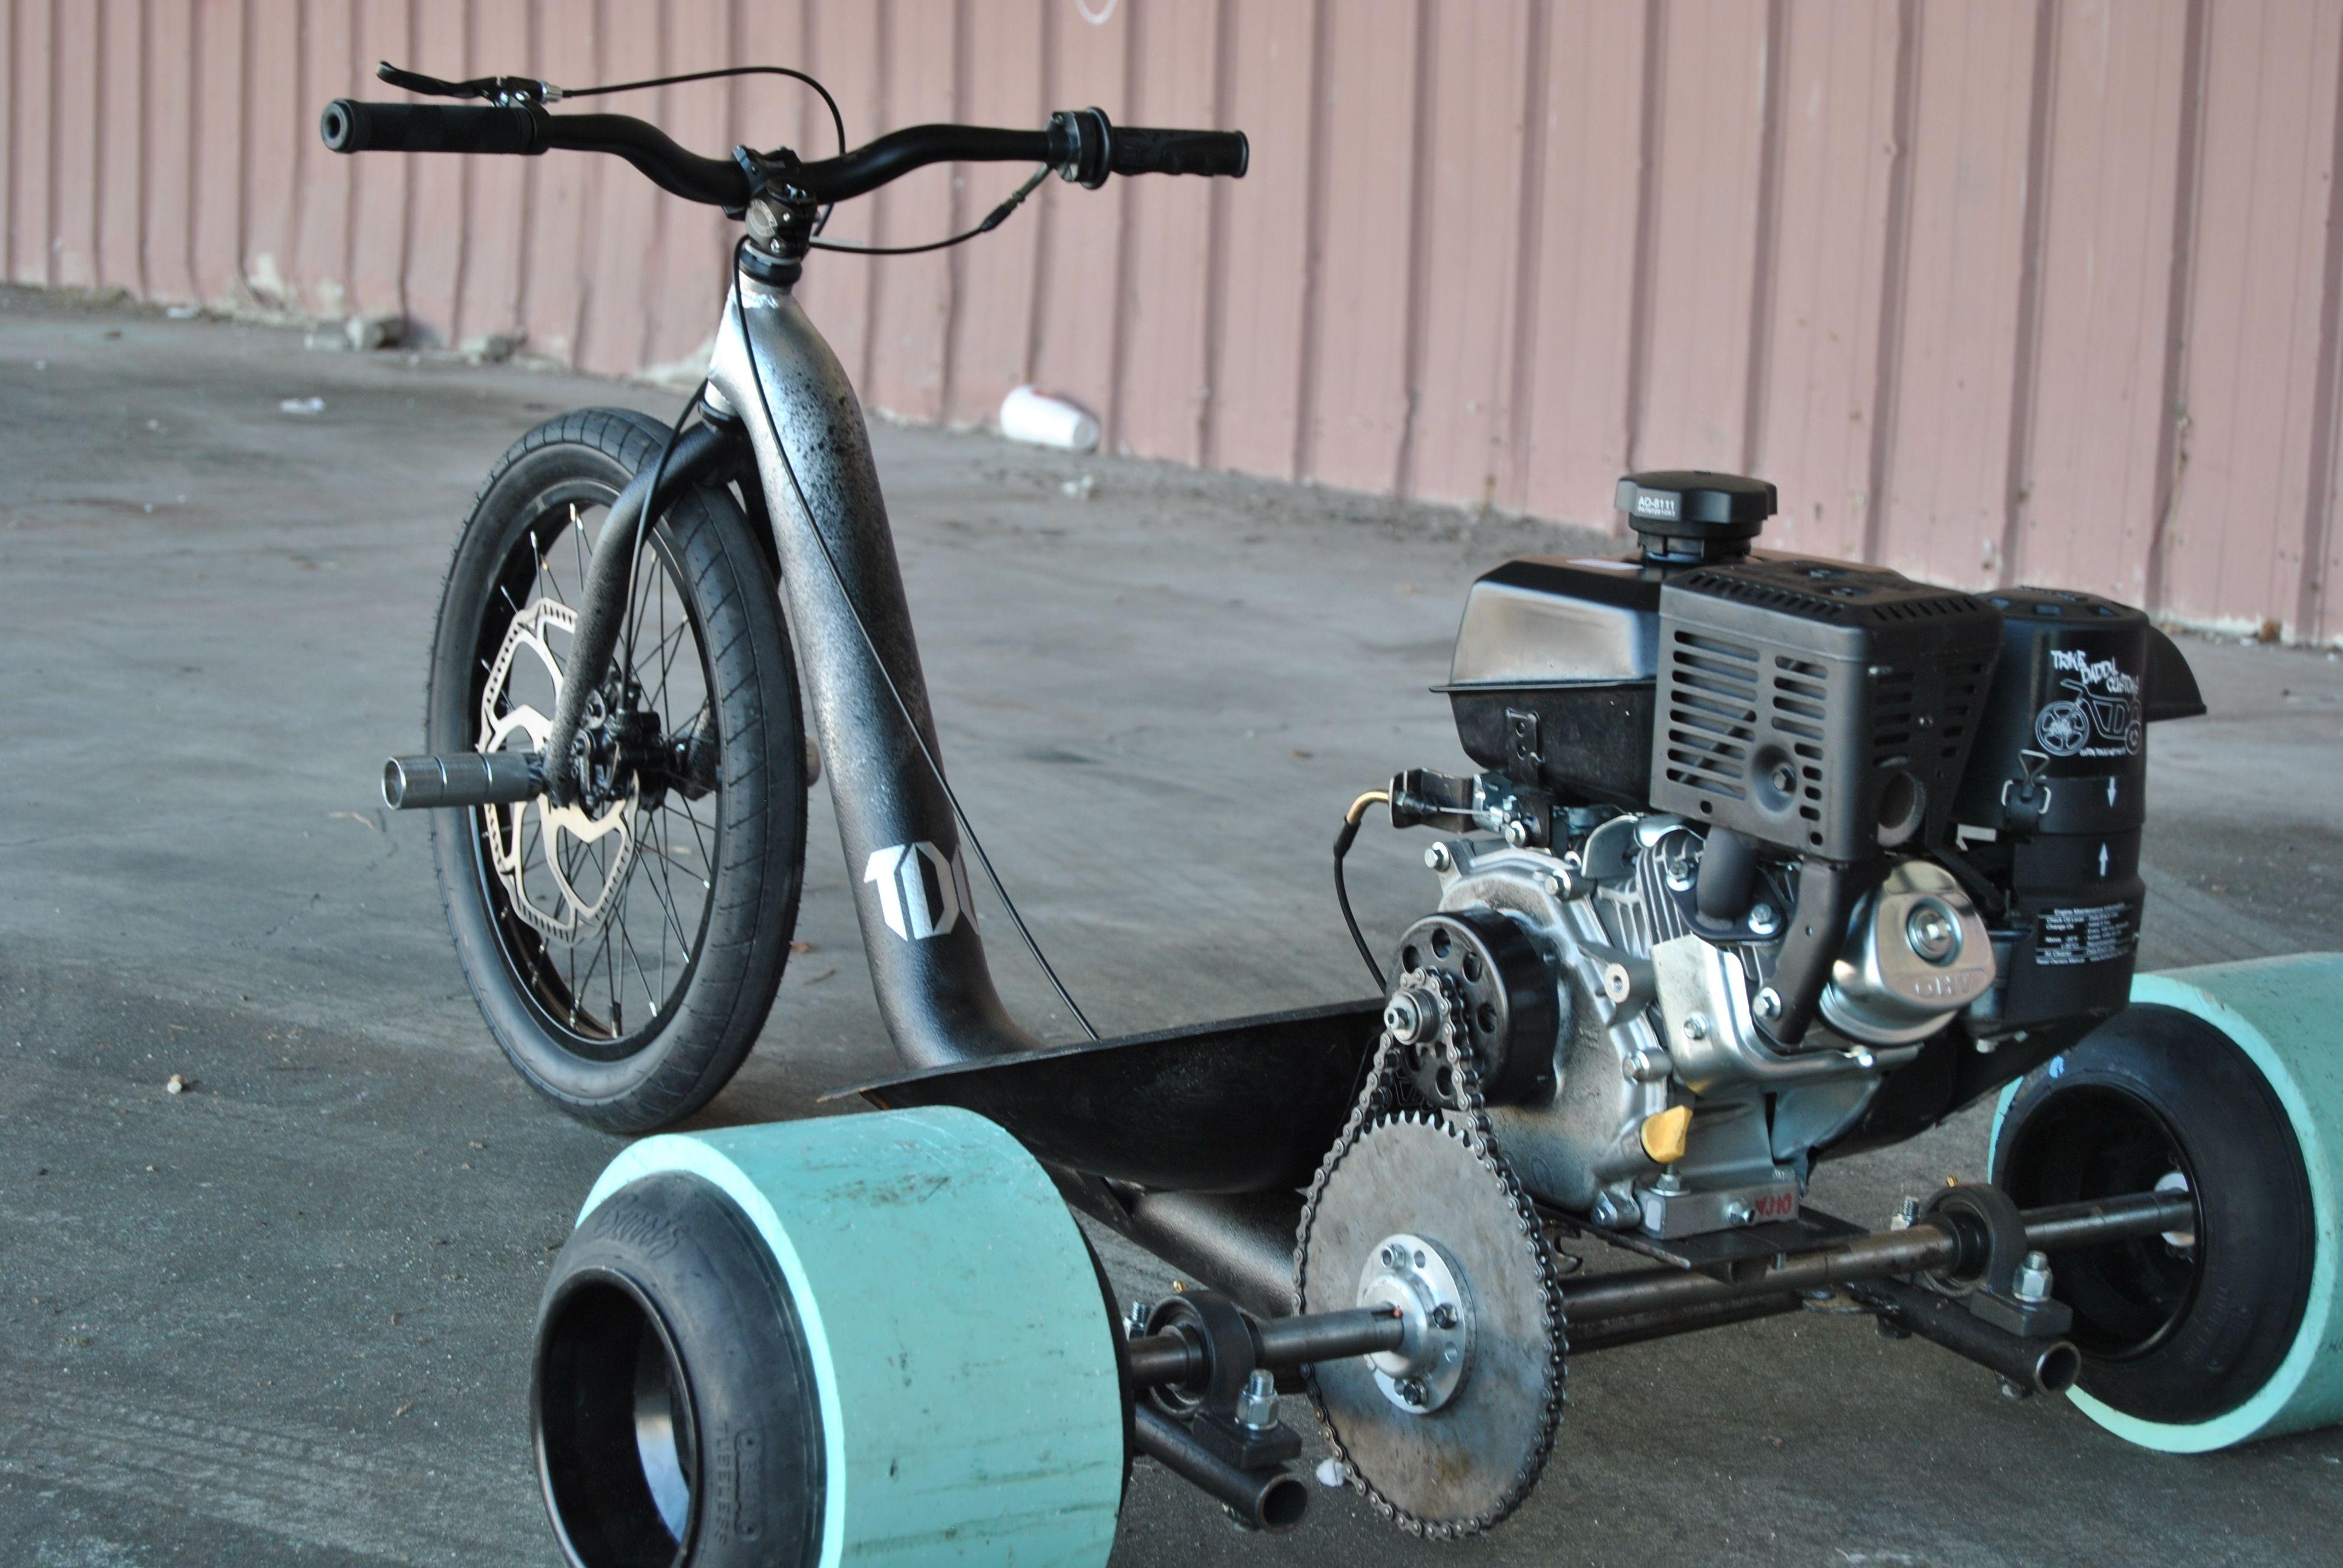 razor dreirad mit elektromotor powerrider 360 2014 us tv. Black Bedroom Furniture Sets. Home Design Ideas